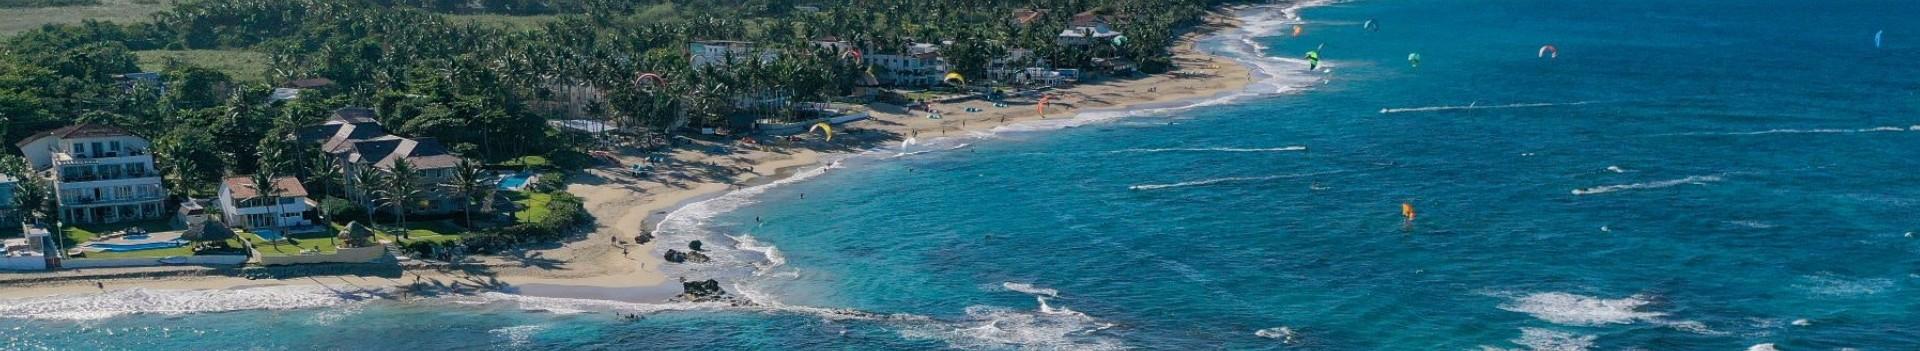 kitesurfing in cabarete in the dominican republic